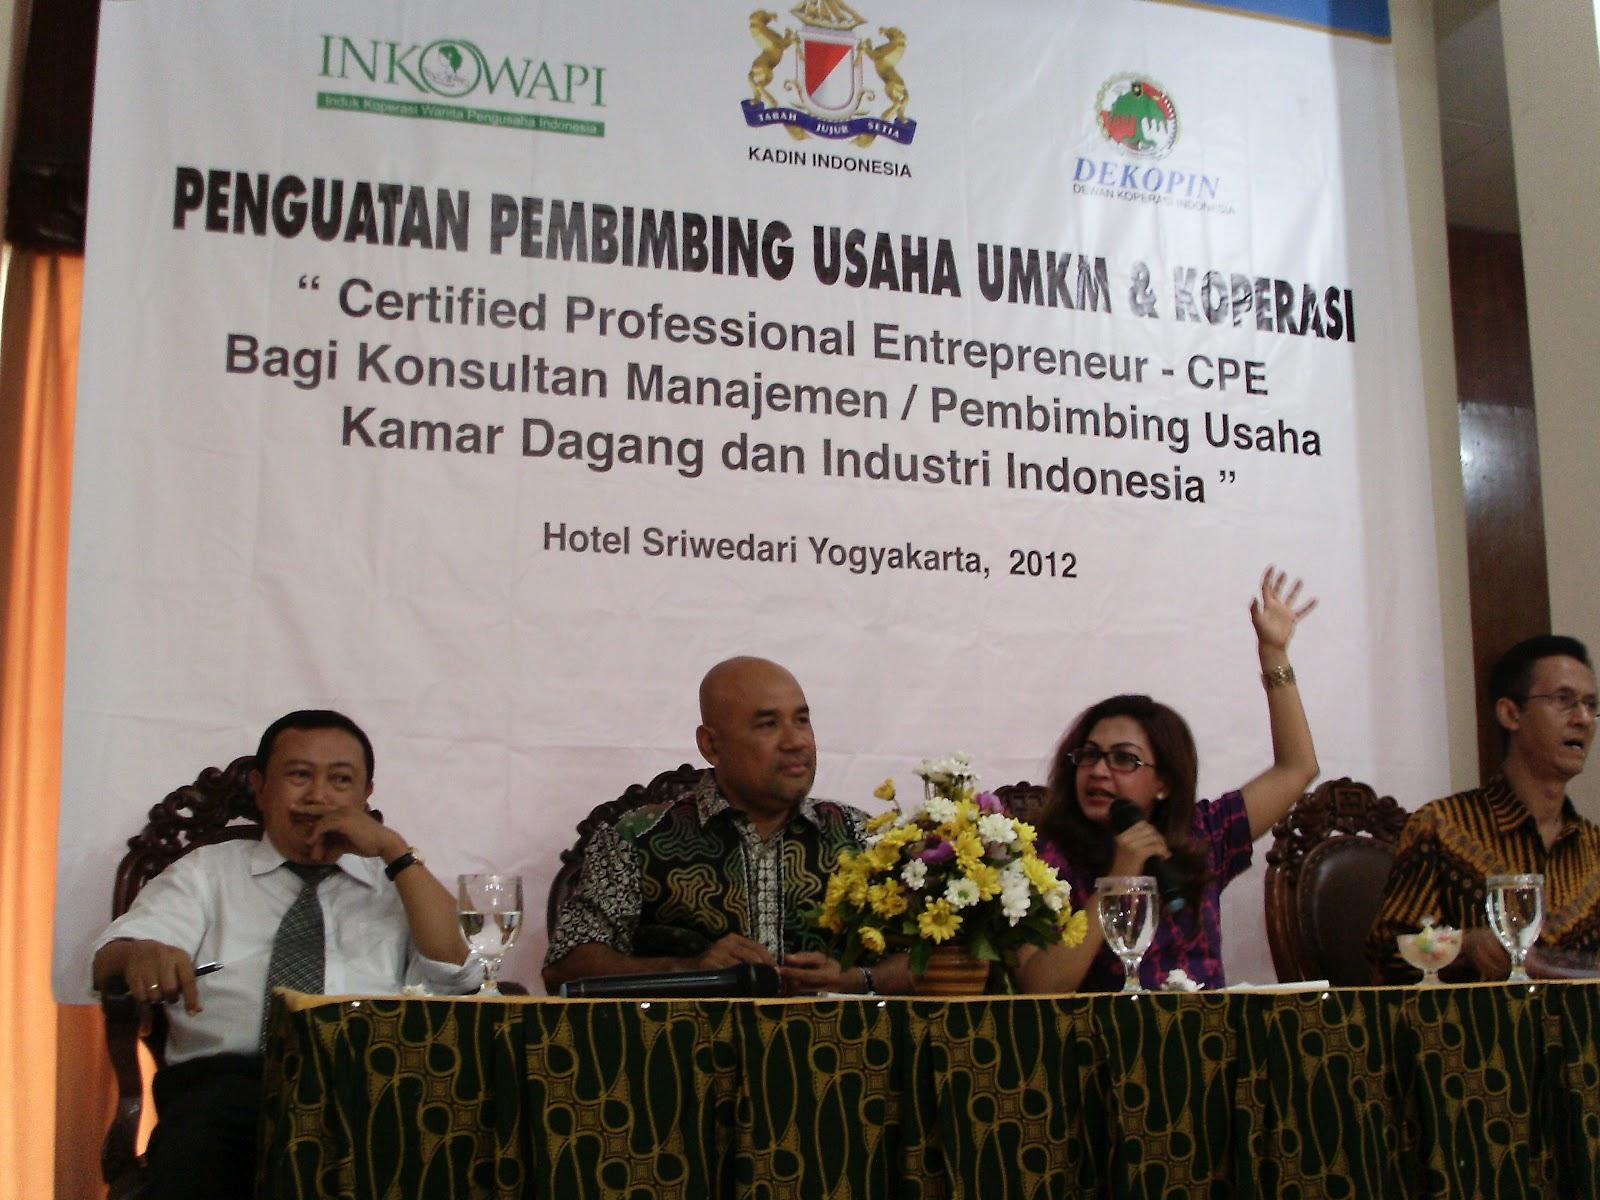 Pusat Pengembangan Umkm Jateng 2012 Produk Ukm Bumn Ikan Nila Sarmila Dari Dewan Koperasi Indonesia Memberikan Orasi Tantangan Memajukan Dan Di Ini Disampaikan Dalam Pelatihan